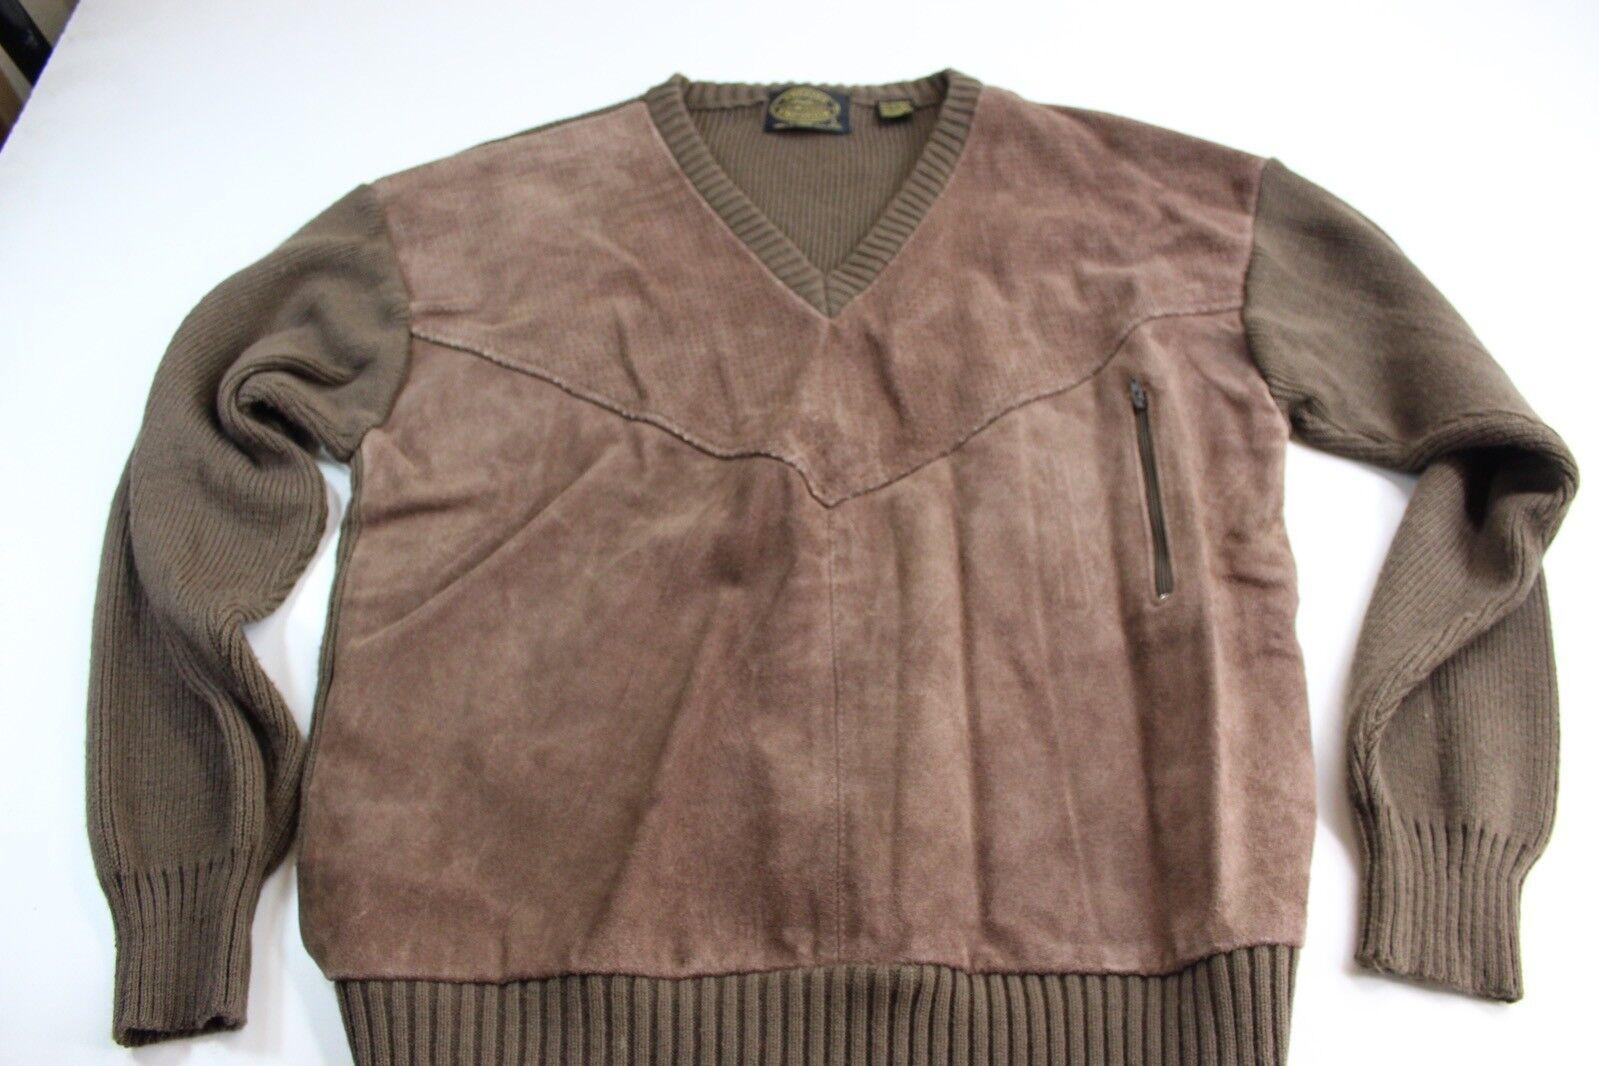 VTG Sweater Emporium Cow Suede Leather Front Unique SWEATER Large L Slim